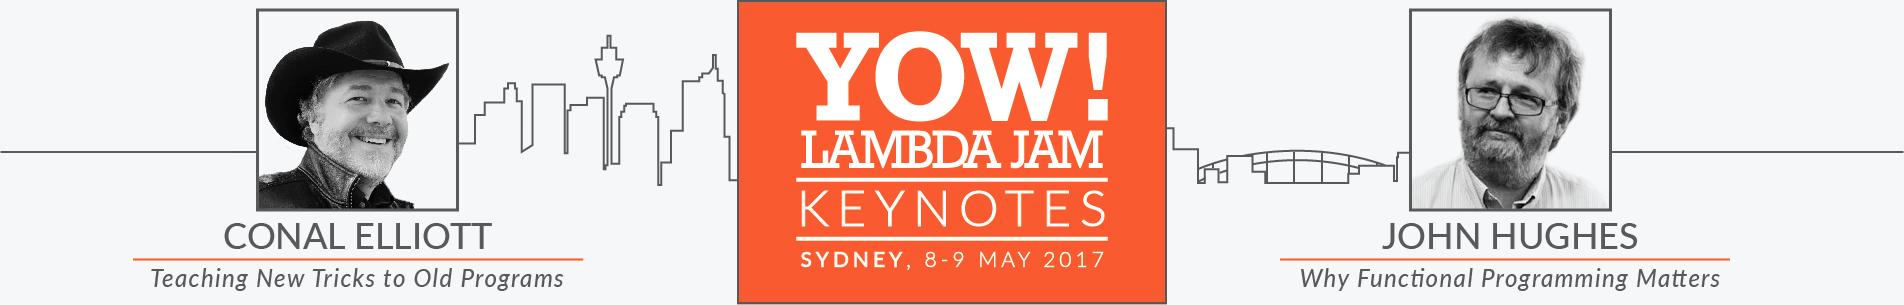 LAMBDA JAM 2017 KEYNOTES